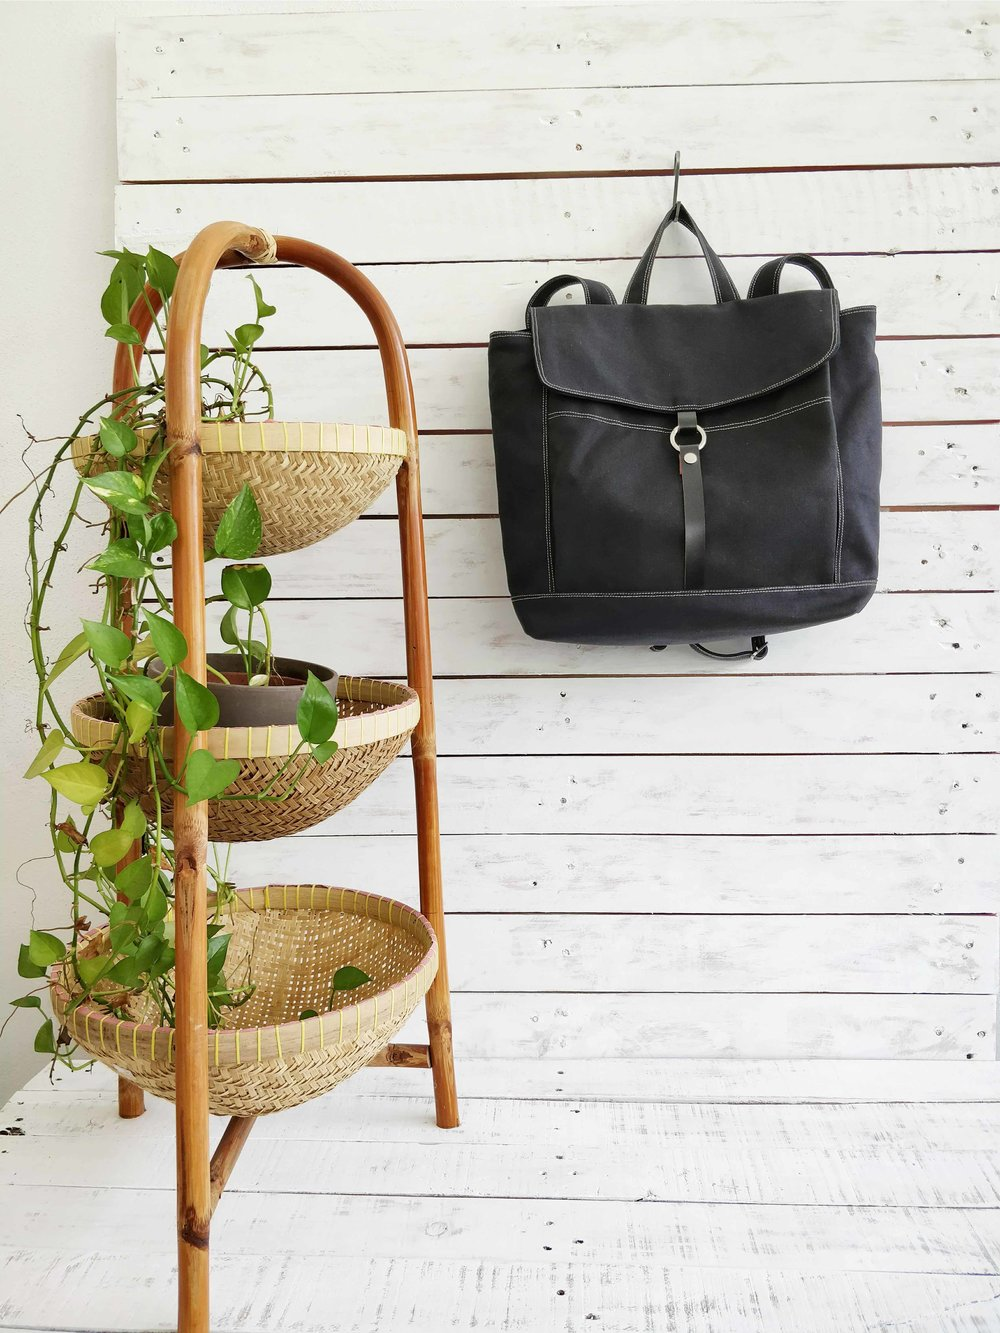 Best Partner in your Journey - TANYA 102 Backpack In BLACK